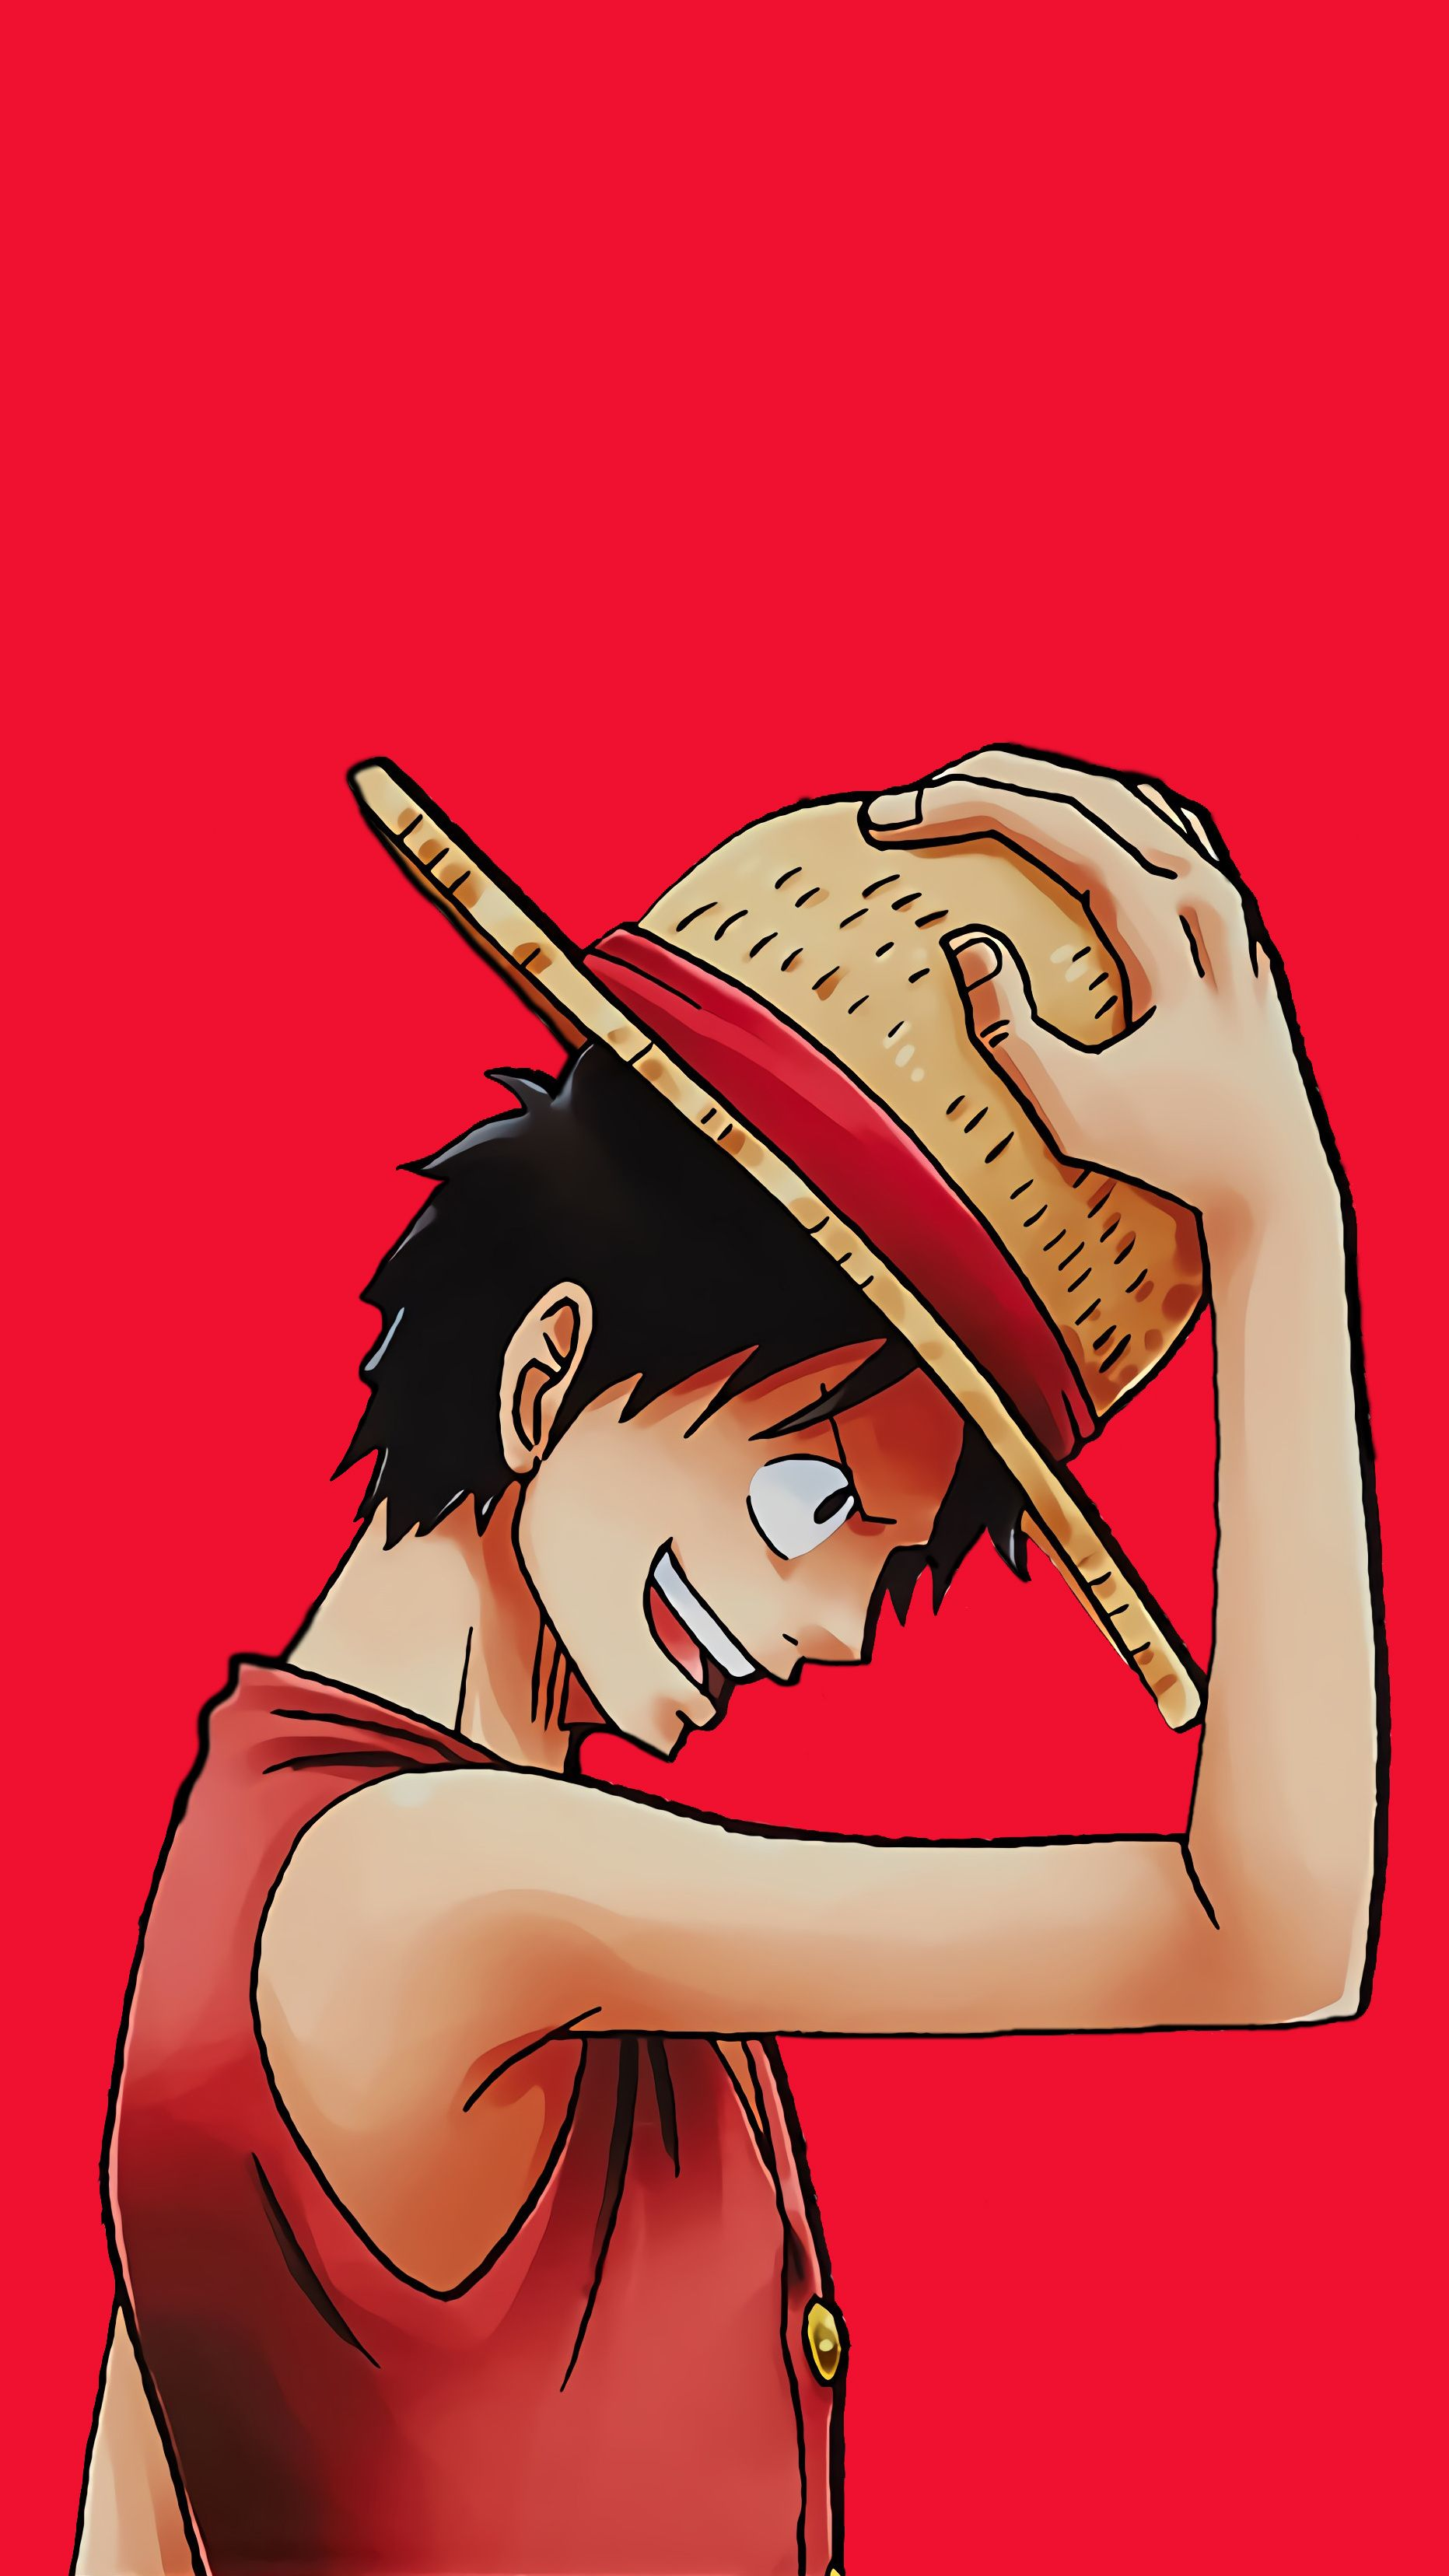 Epingle Par Aslam Karim Sur Monkey D Luffy Dessin Manga Manga Celebre Dessin One Piece